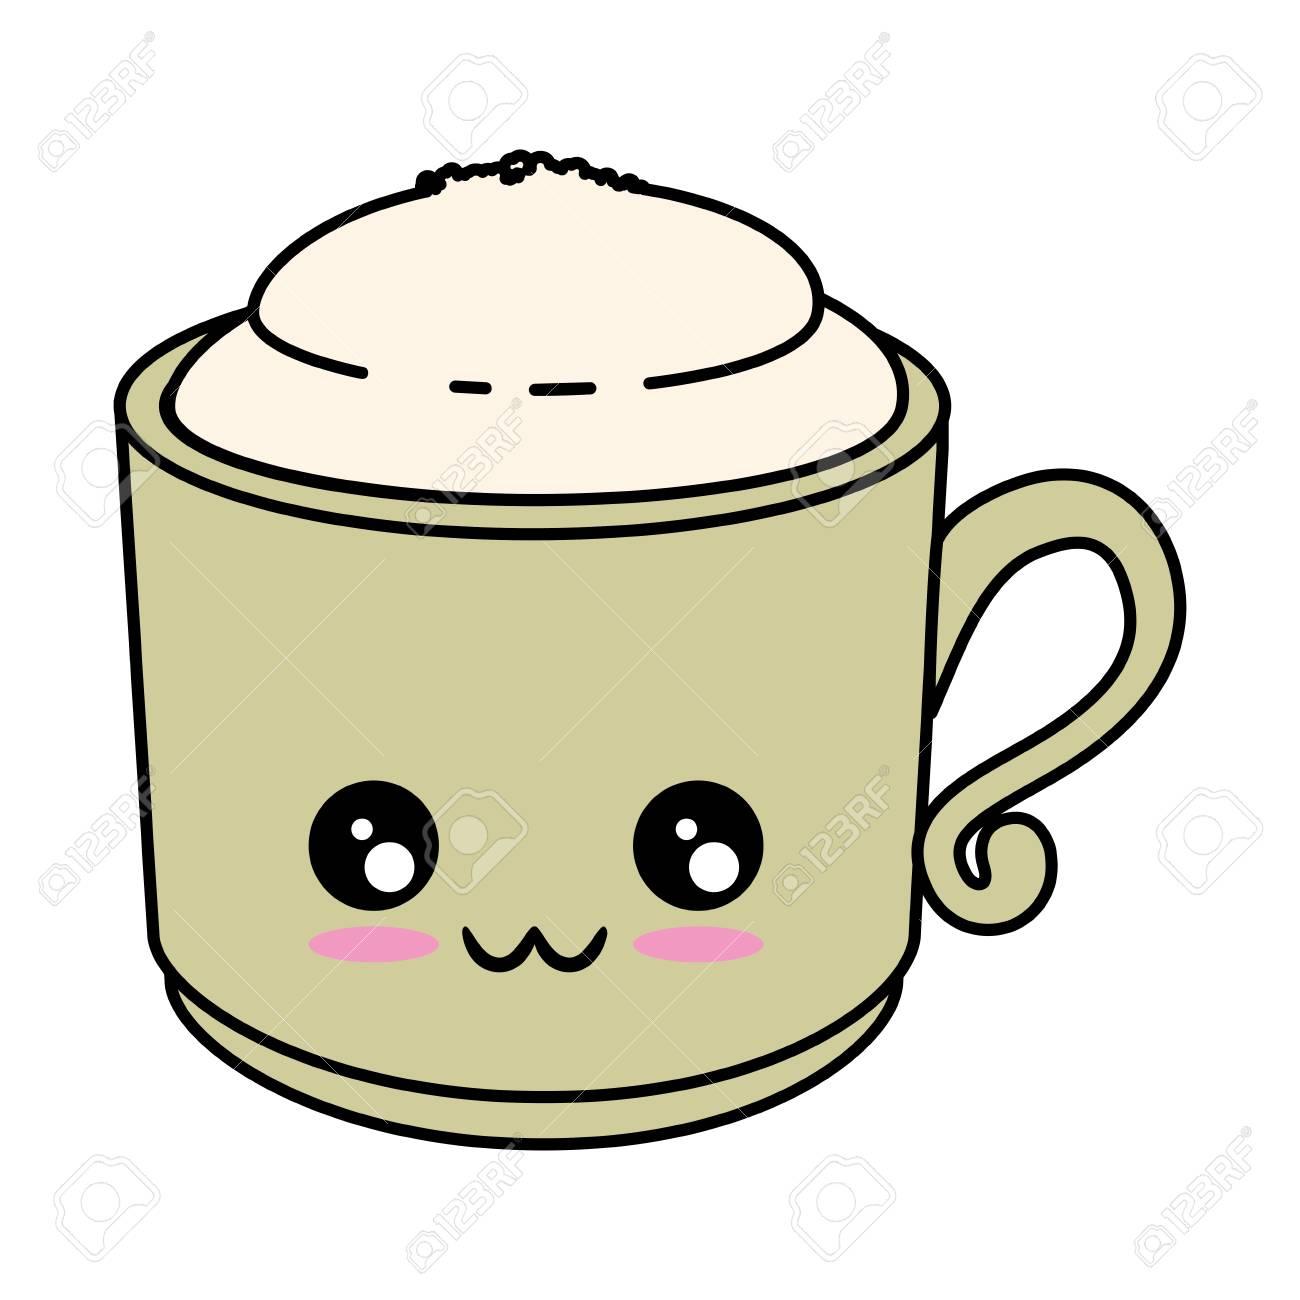 Delicious Coffee Mug Cute Cartoon Vector Ilustration Royalty Free Cliparts Vectors And Stock Illustration Image 84524991